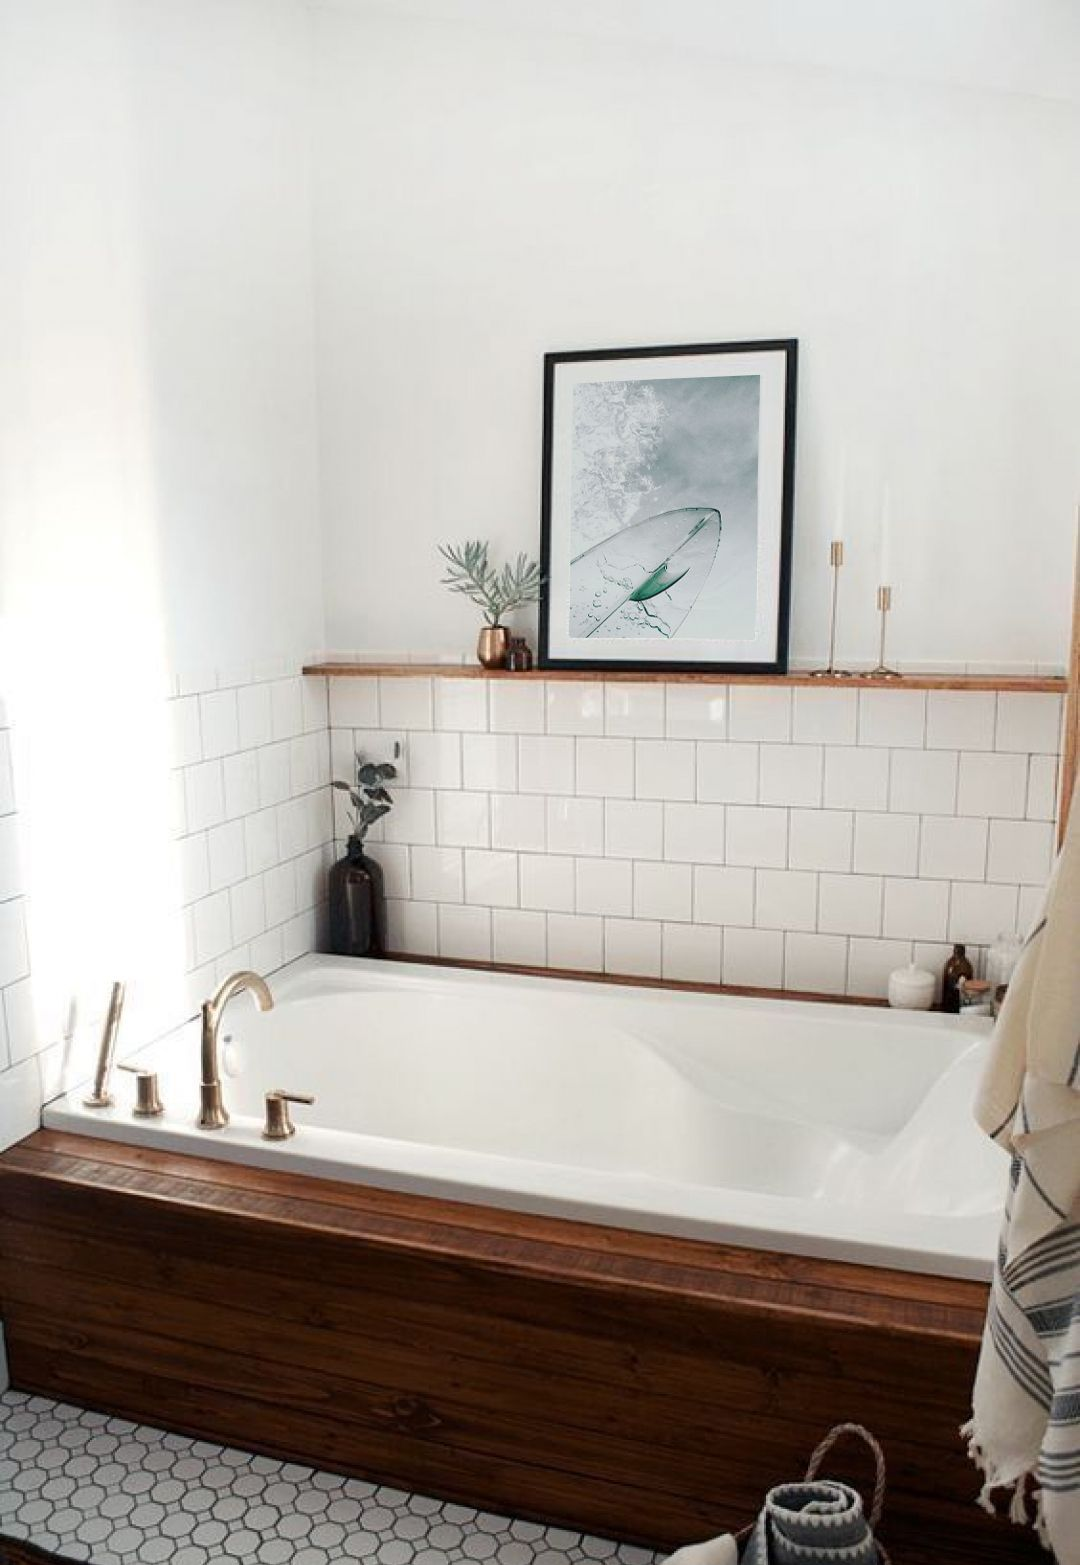 Photo of bathroom decor, surf inspired decor, surf lovers gift, surf diy decor